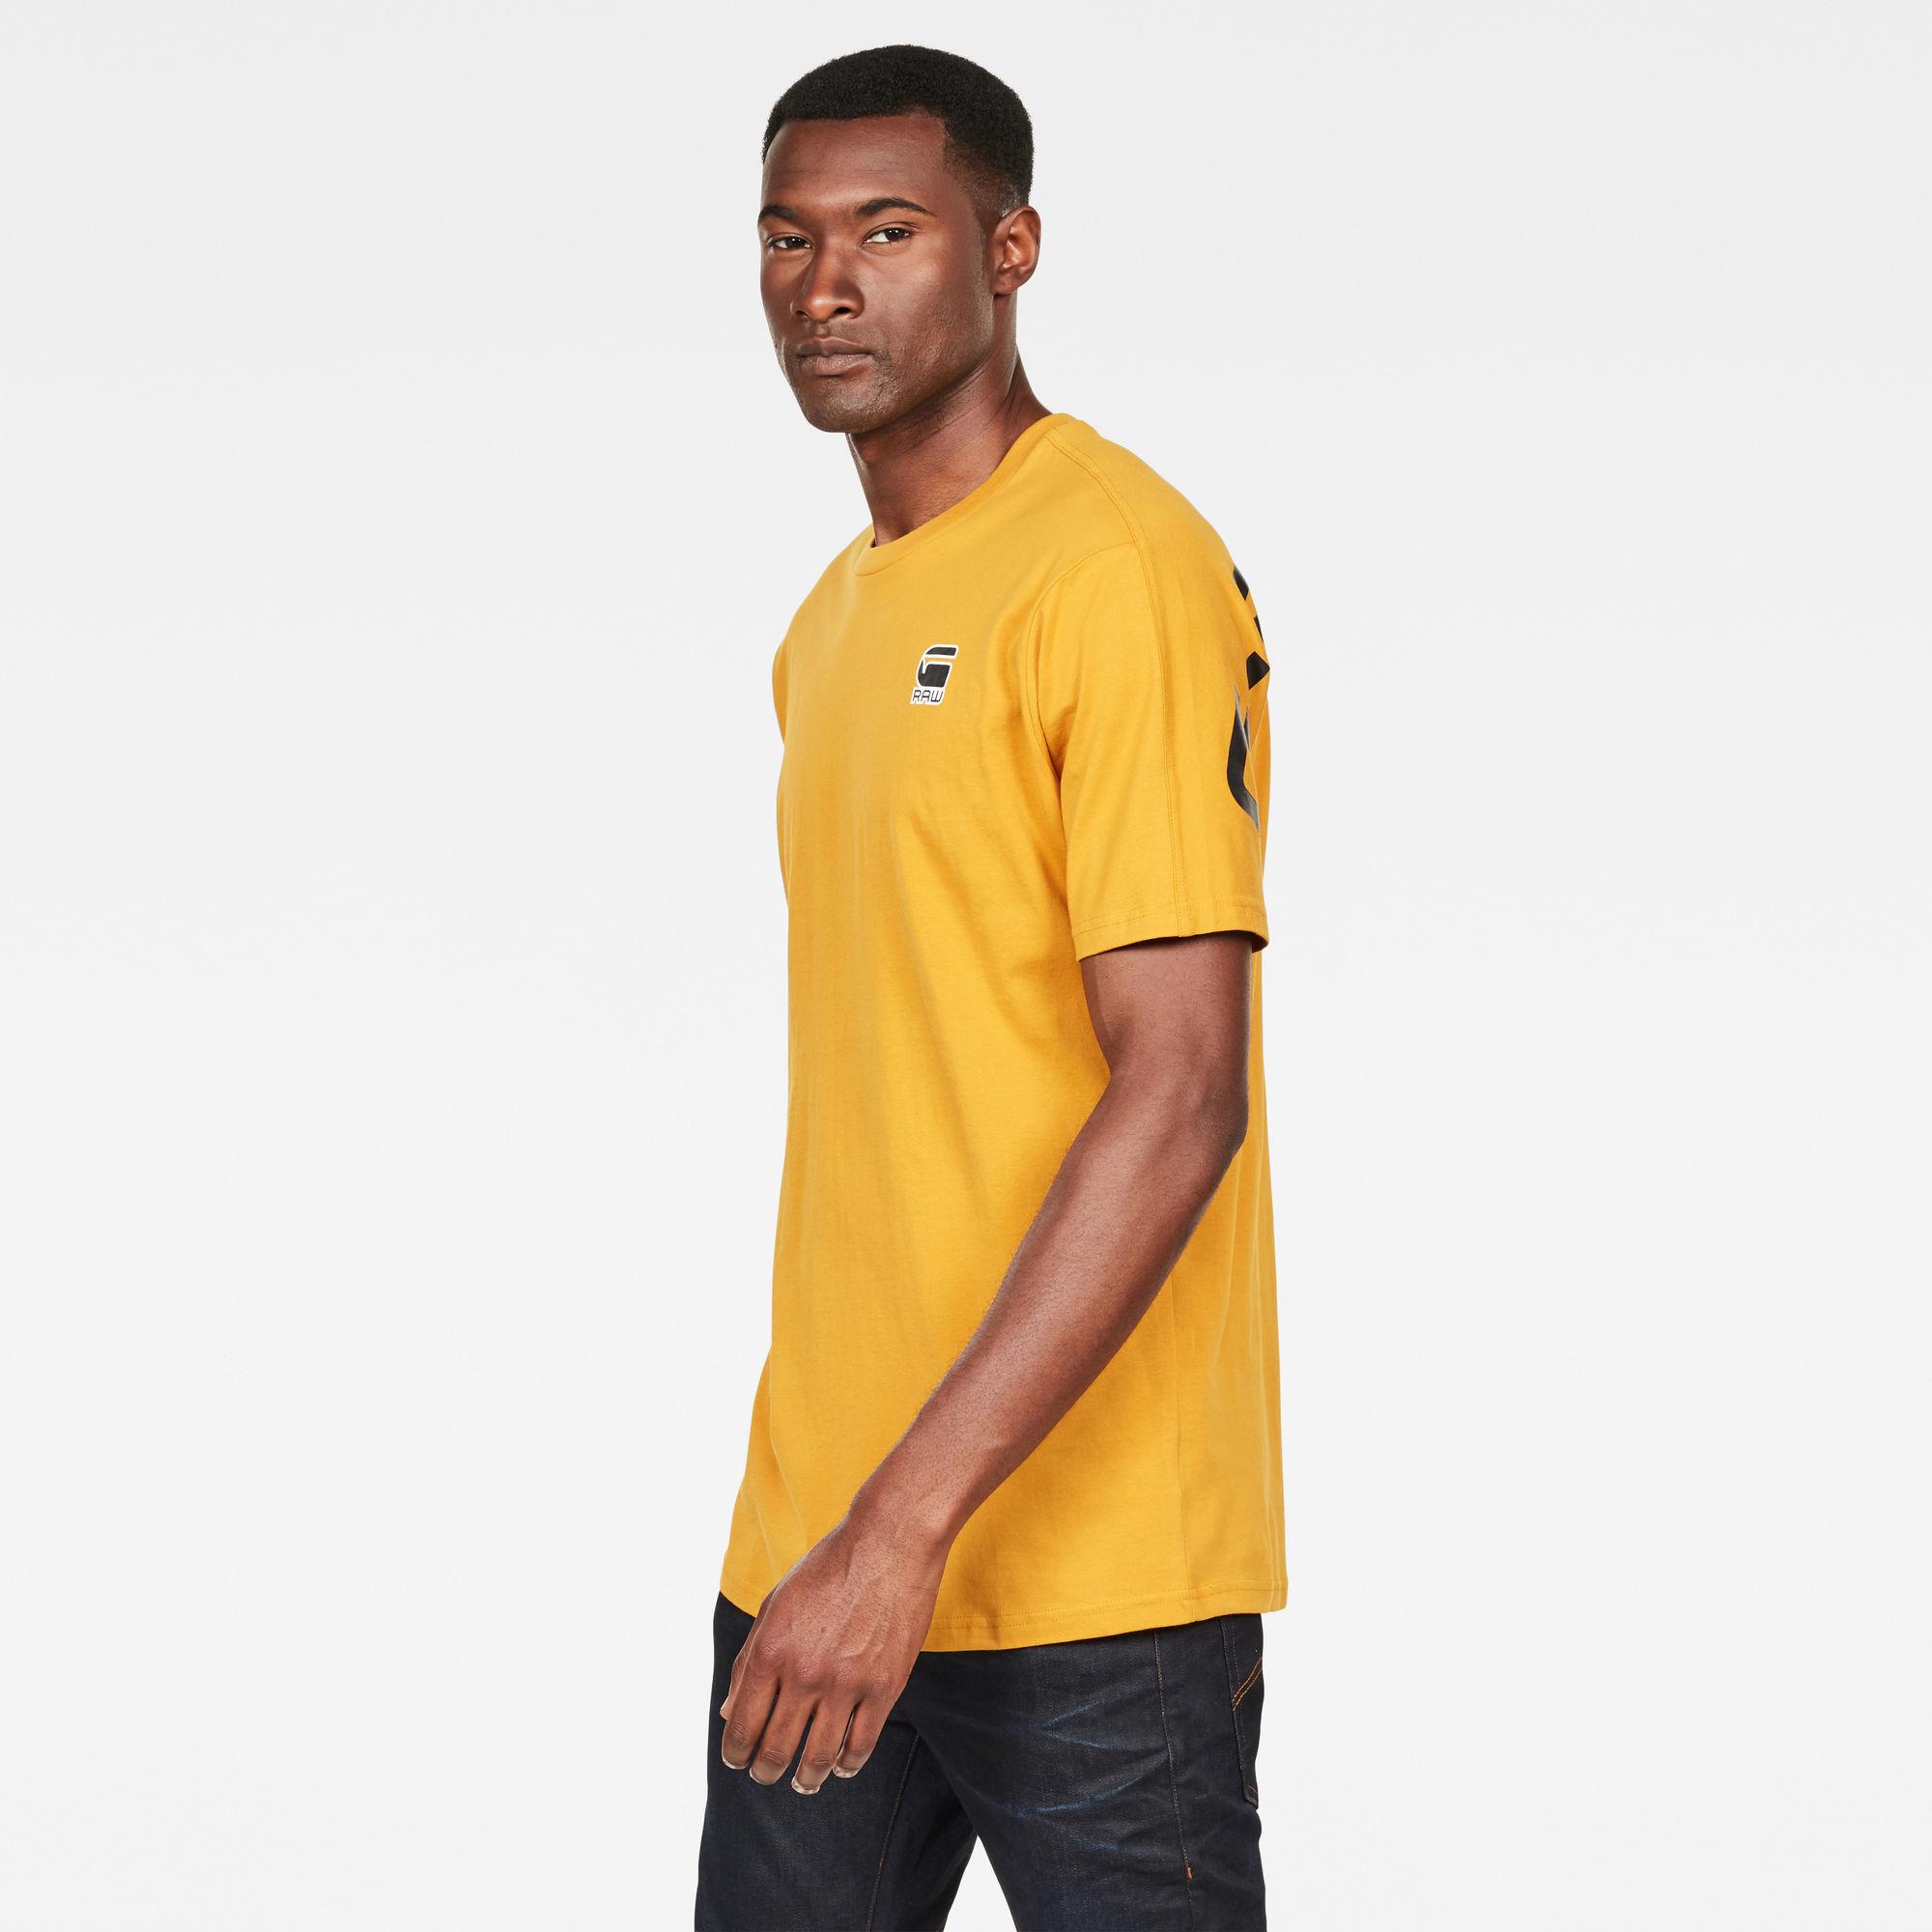 Korpaz-S LogoT-Shirt